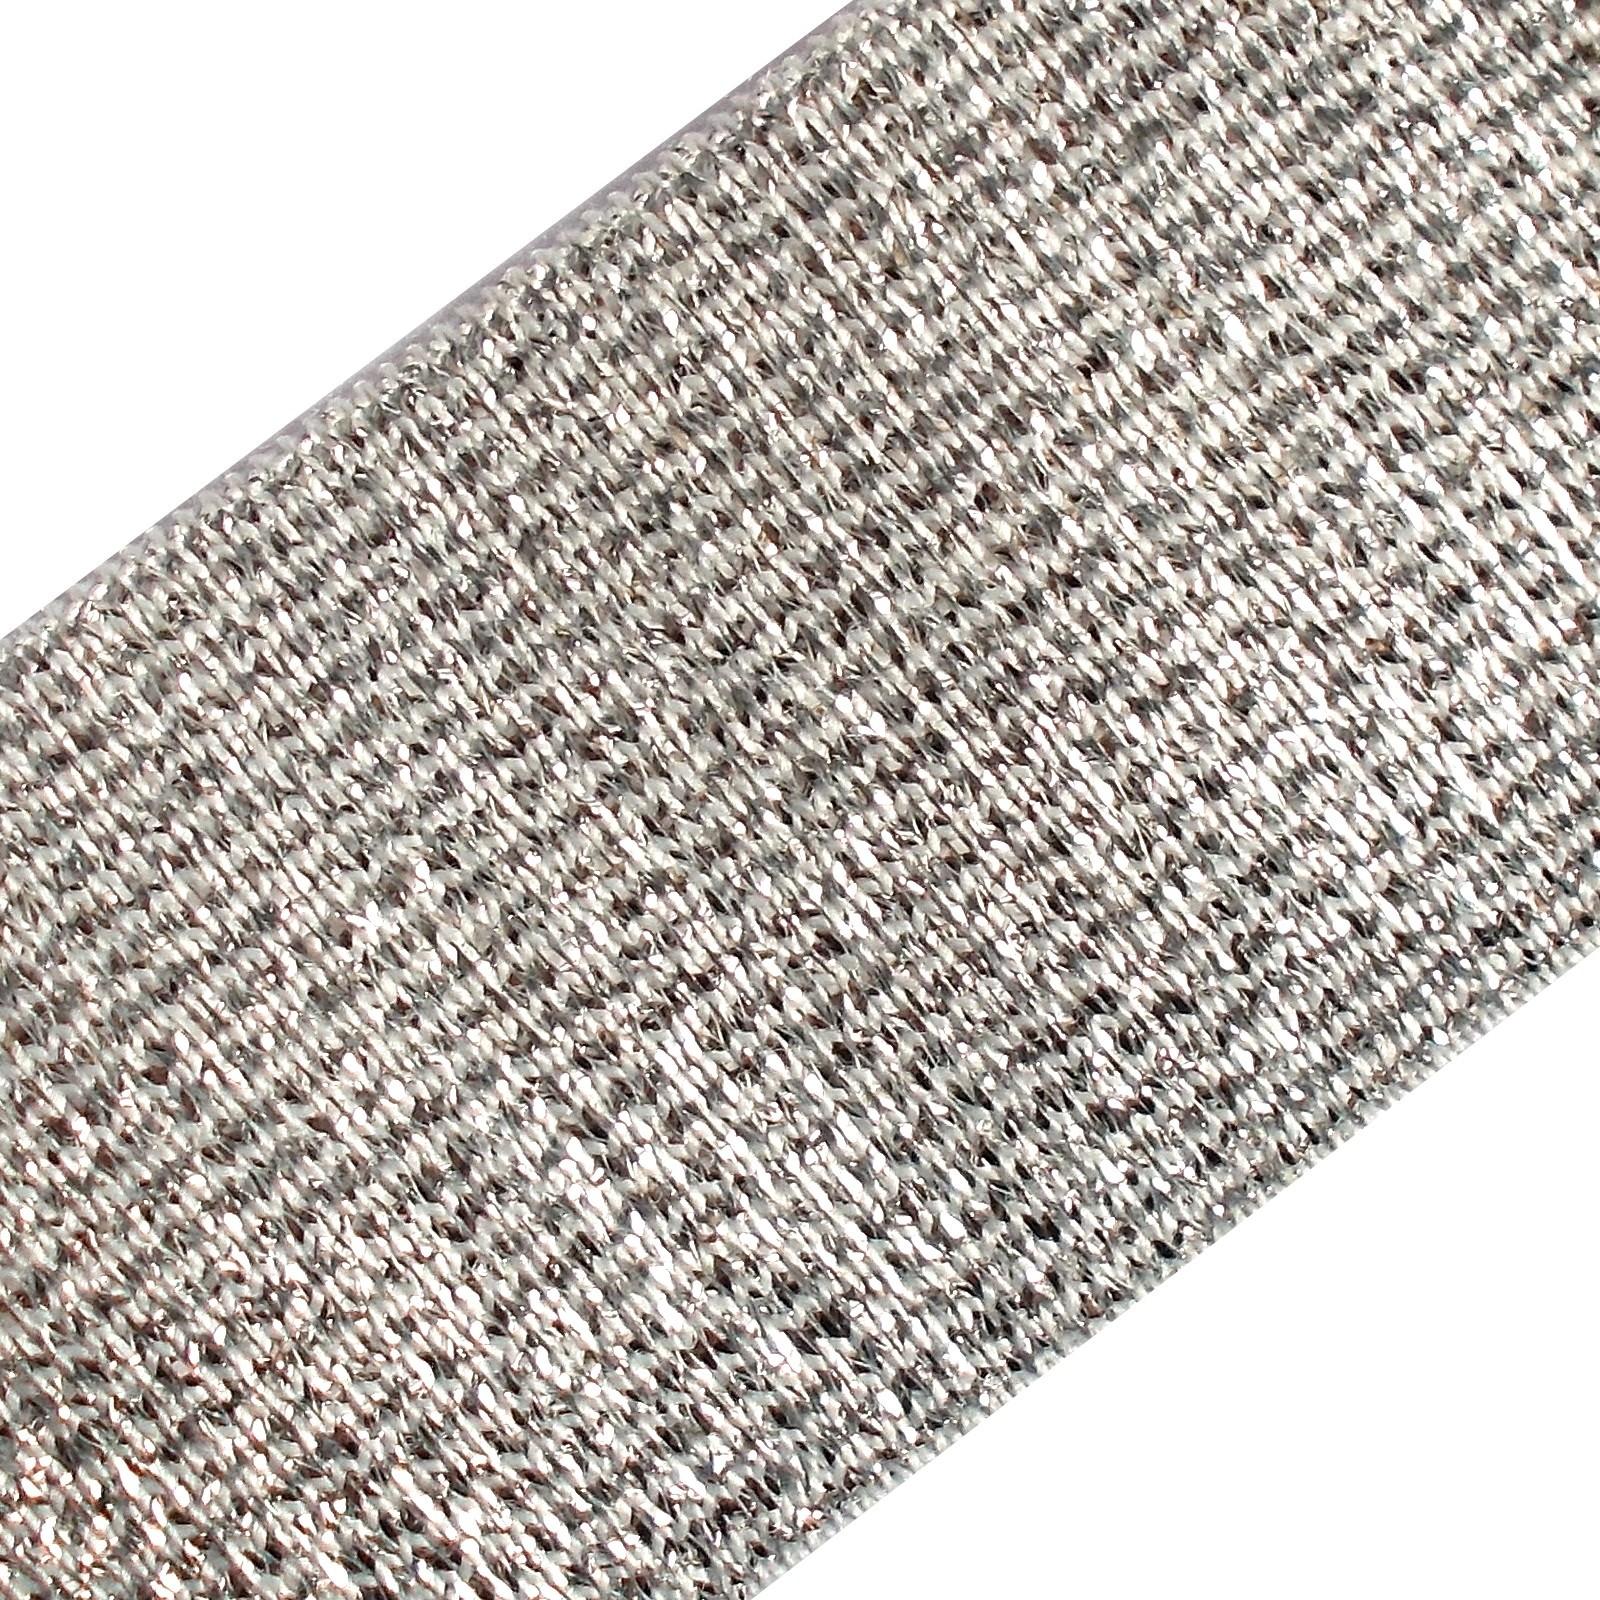 Lurex Elastic Stretch Trim 40mm wide Silver on White 1 metre length